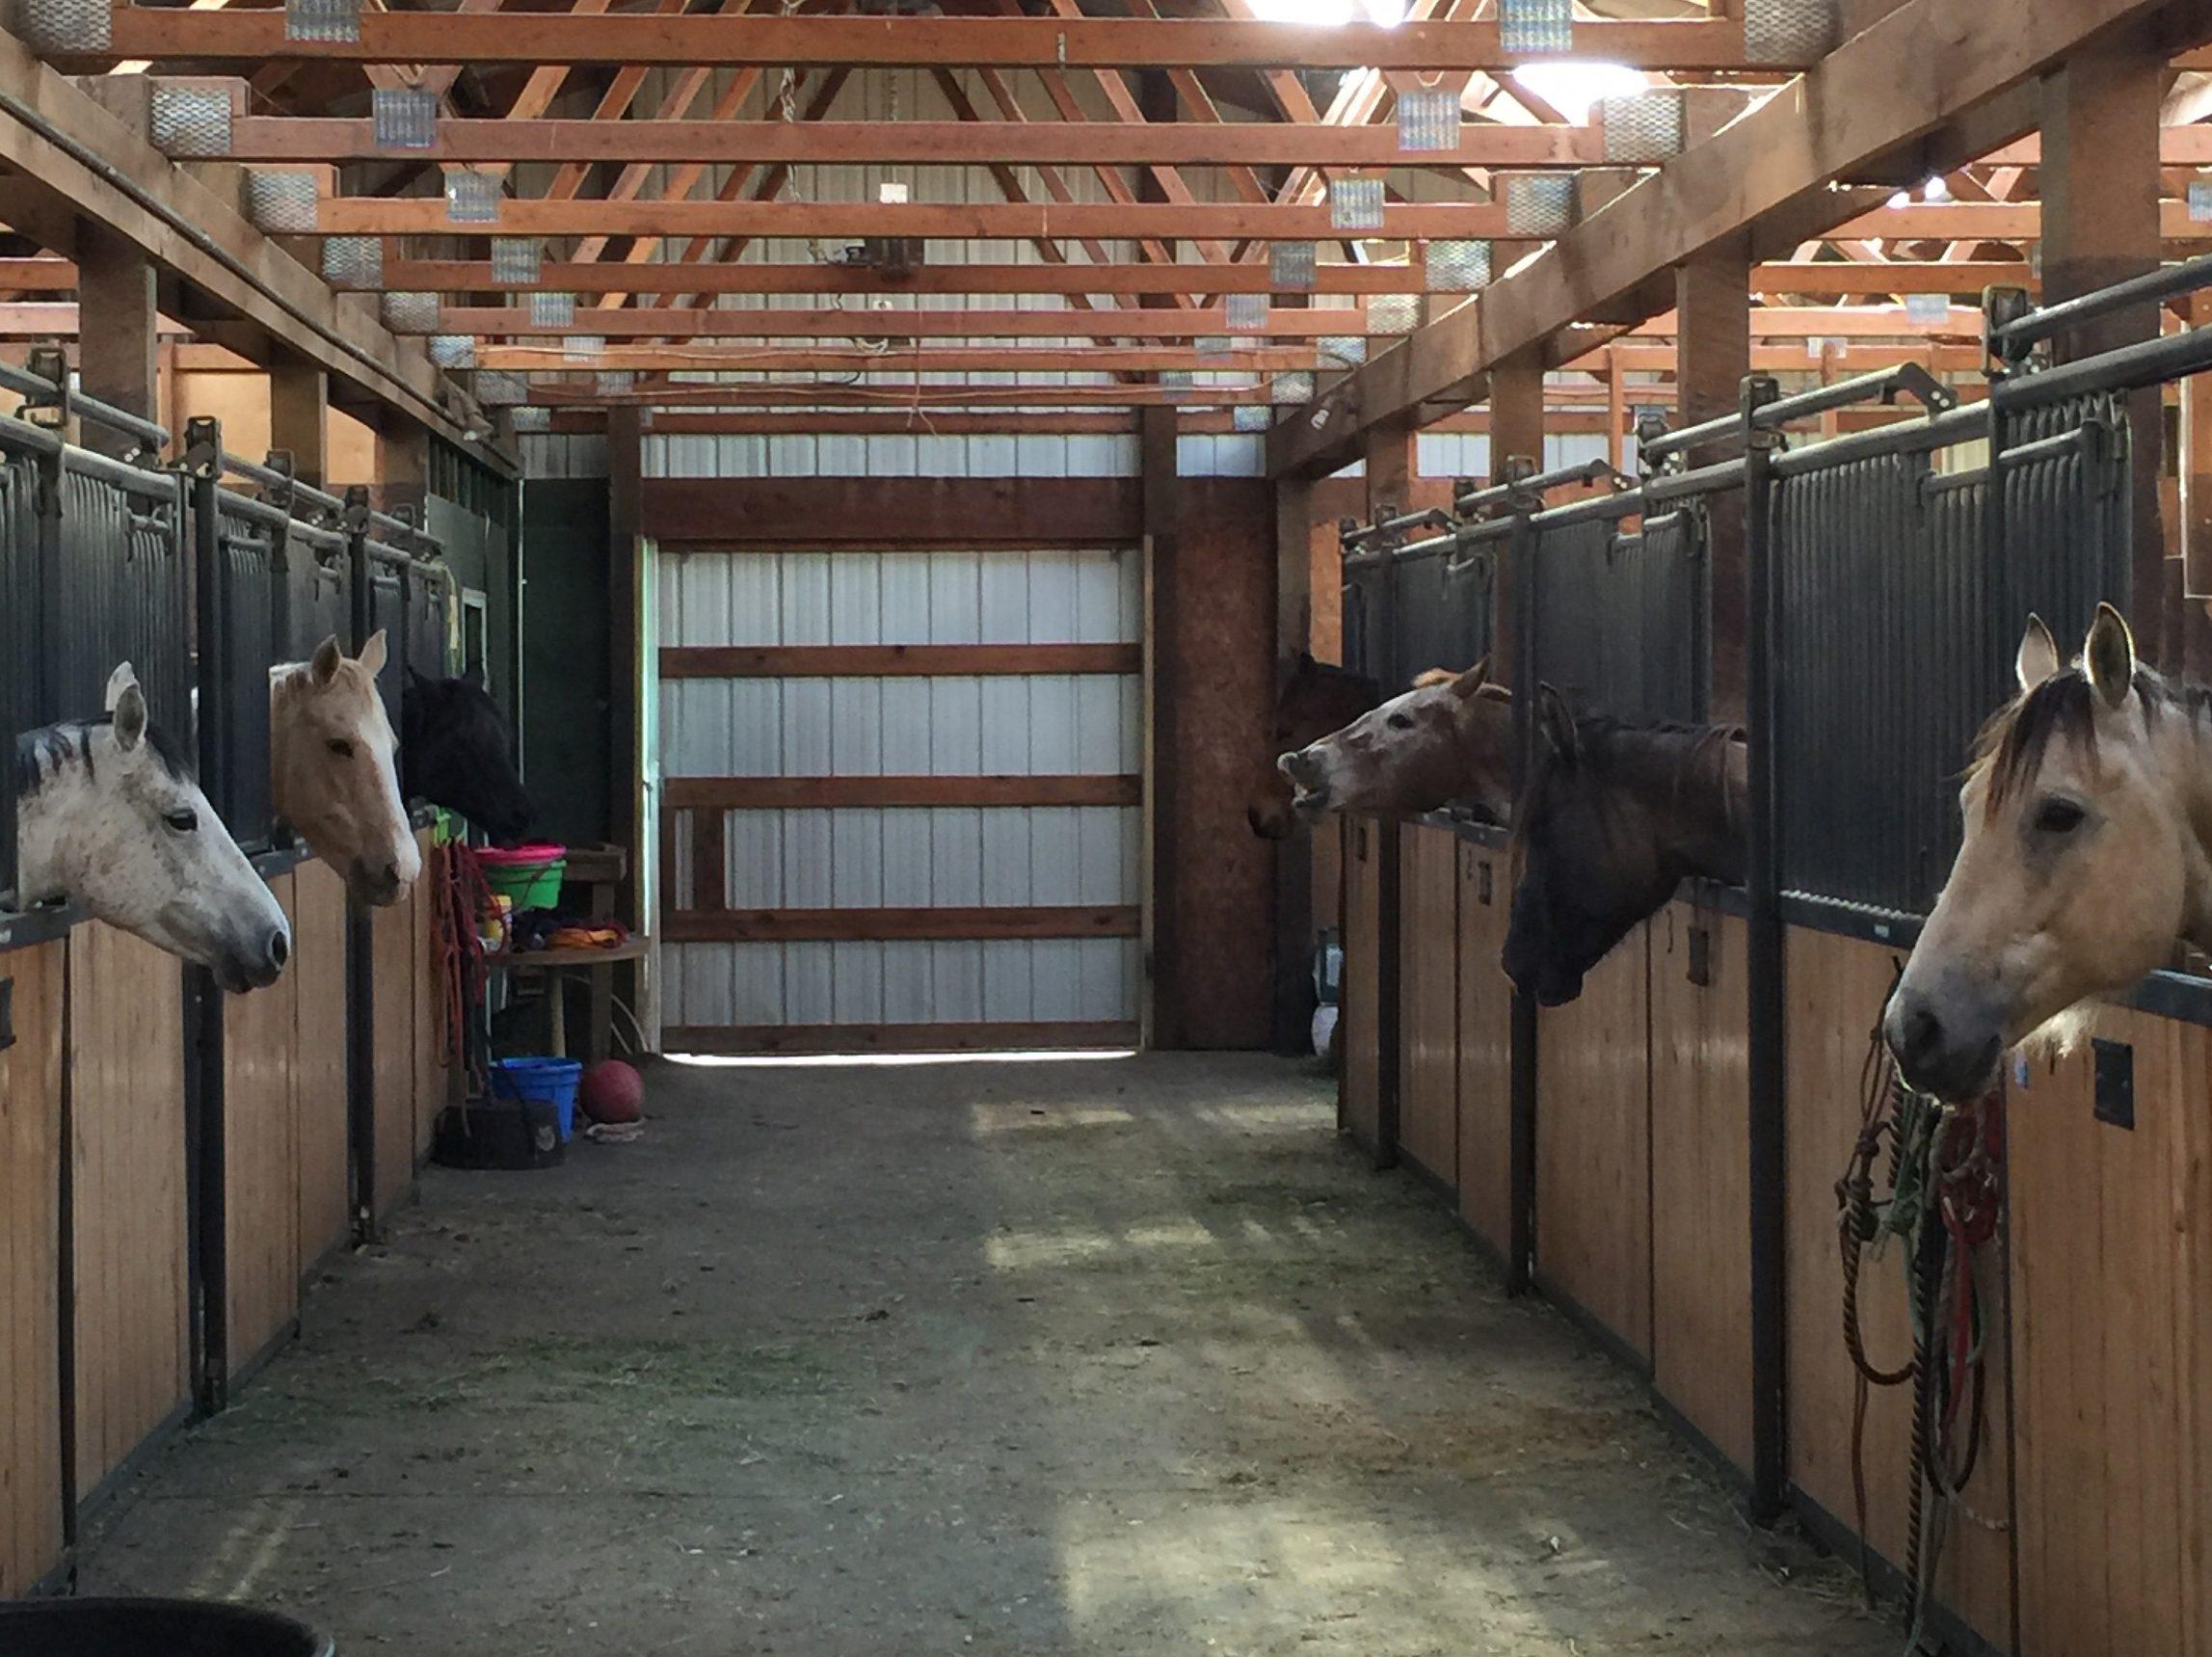 LIV Sotheby's' International Realty Broker, Alissa Skildheim, Rides to Horses' Rescue